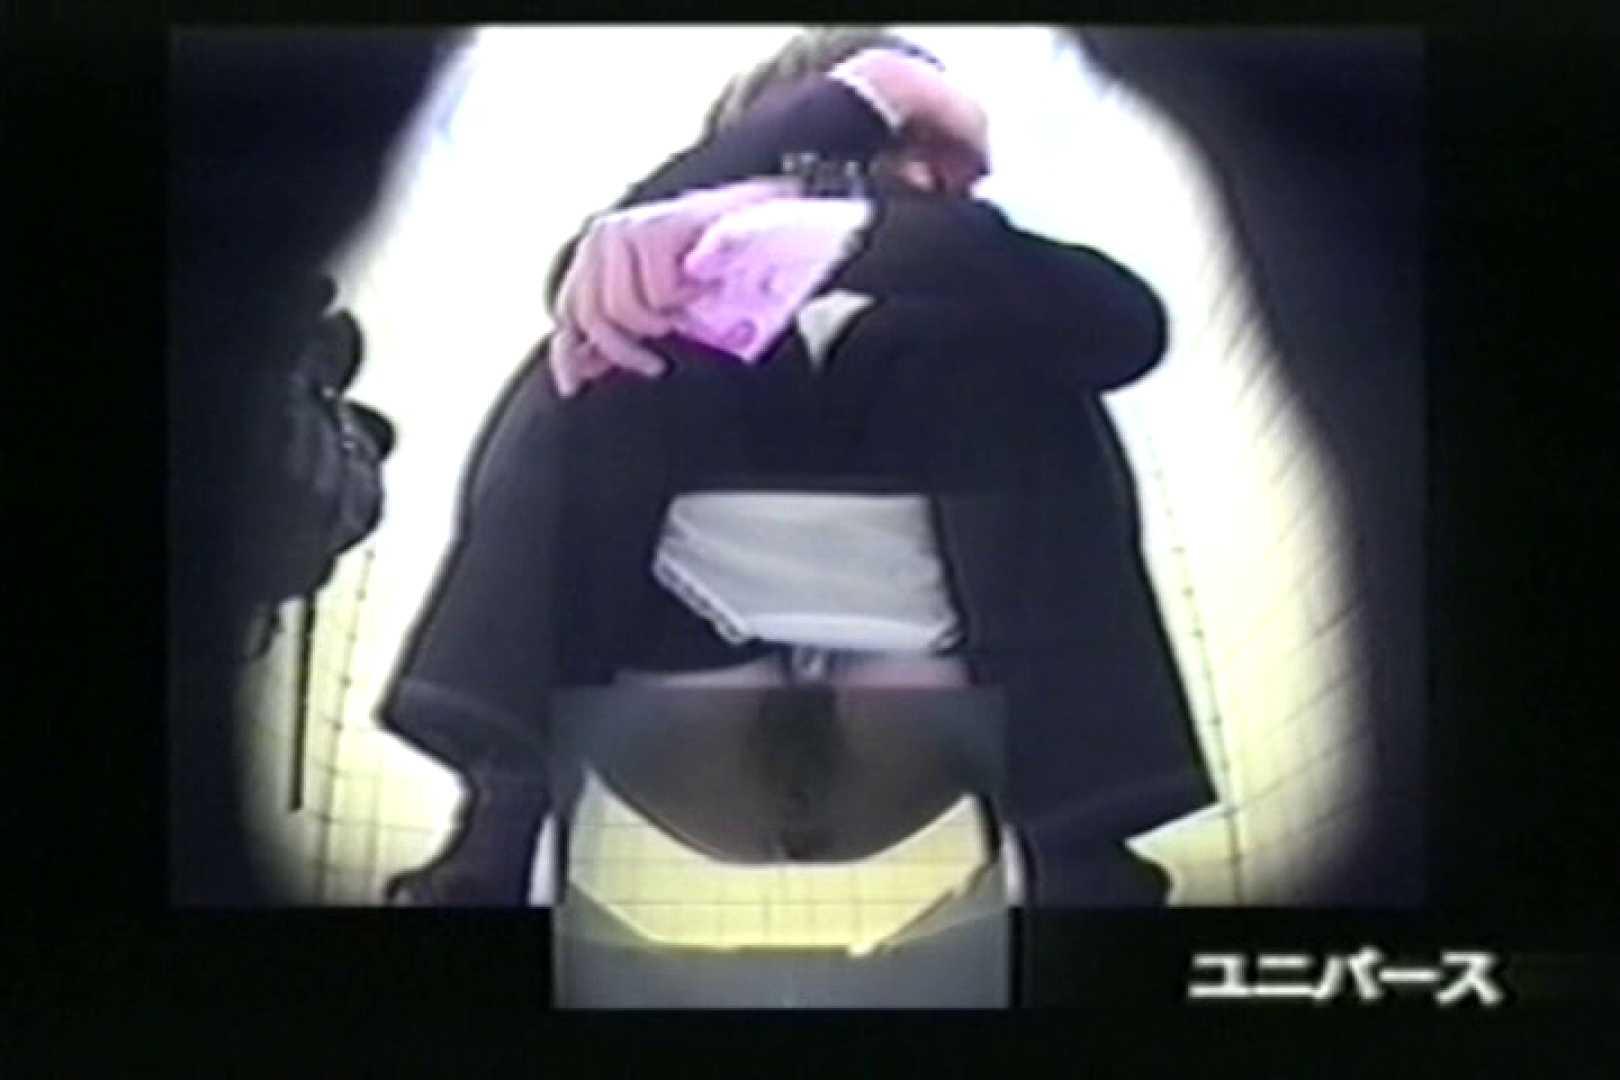 下半身シースルー洗面所Vol.3 OL女体 オメコ無修正動画無料 78連発 47